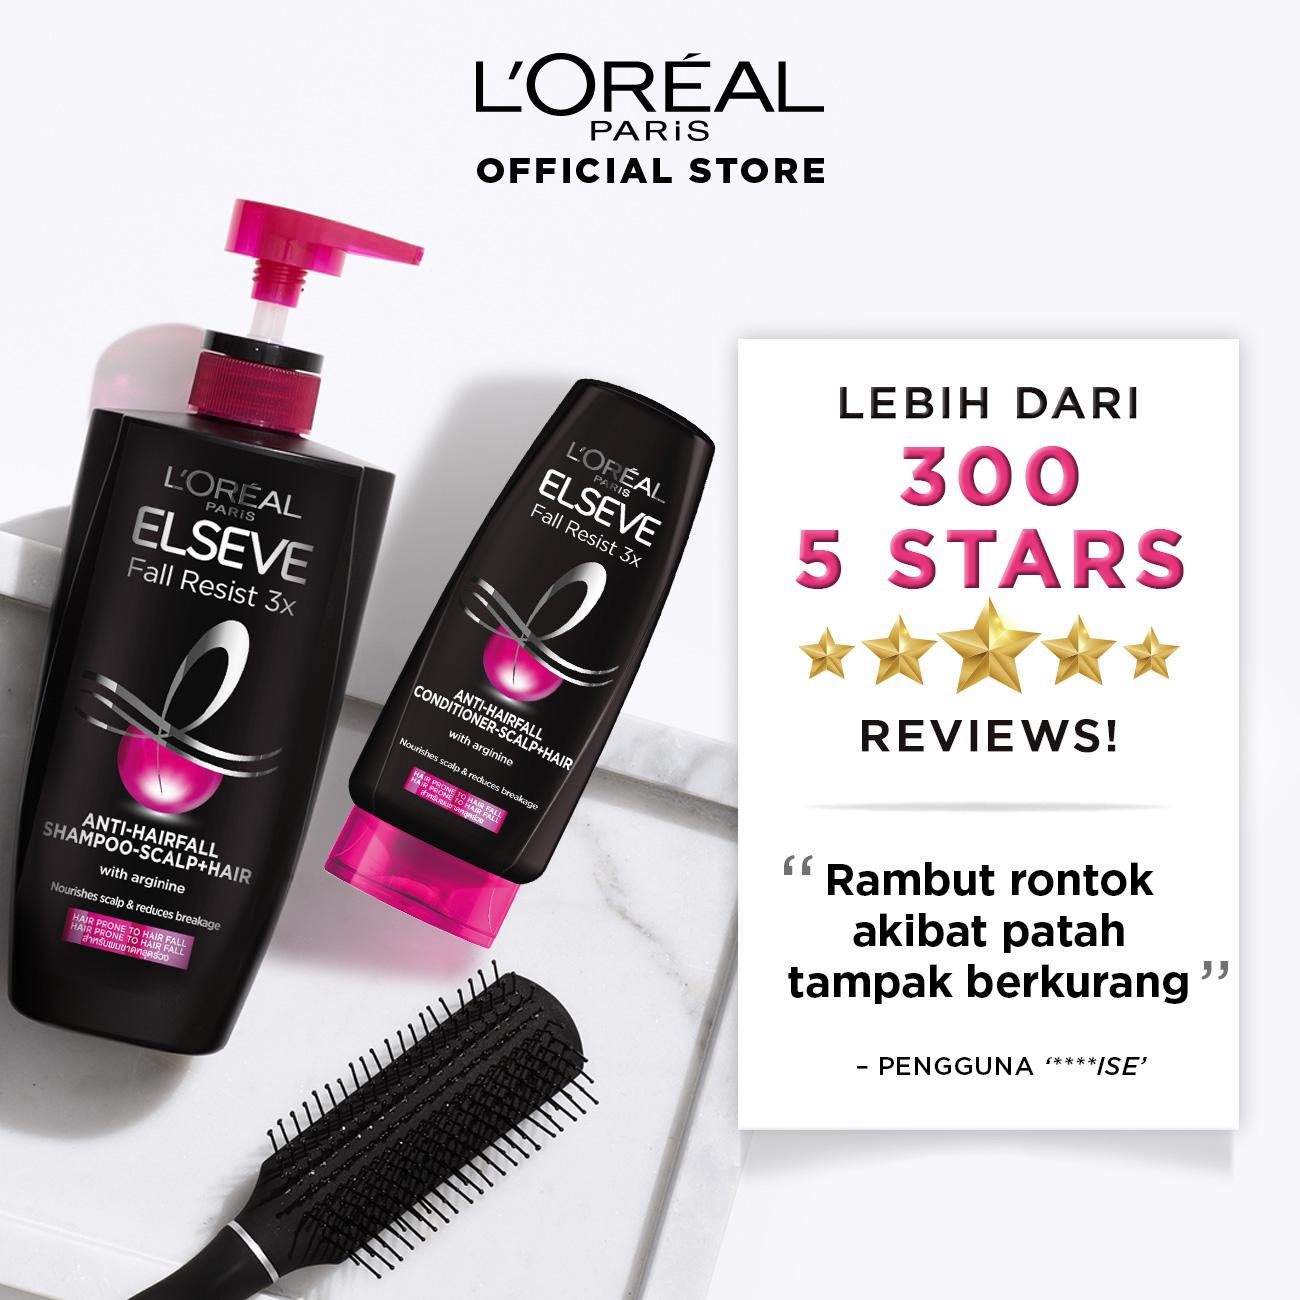 L'Oreal Paris Fall Resist 3x Shampoo Hair Care - 280ml (Perawatan Untuk Rambut Mudah Rontok)-7